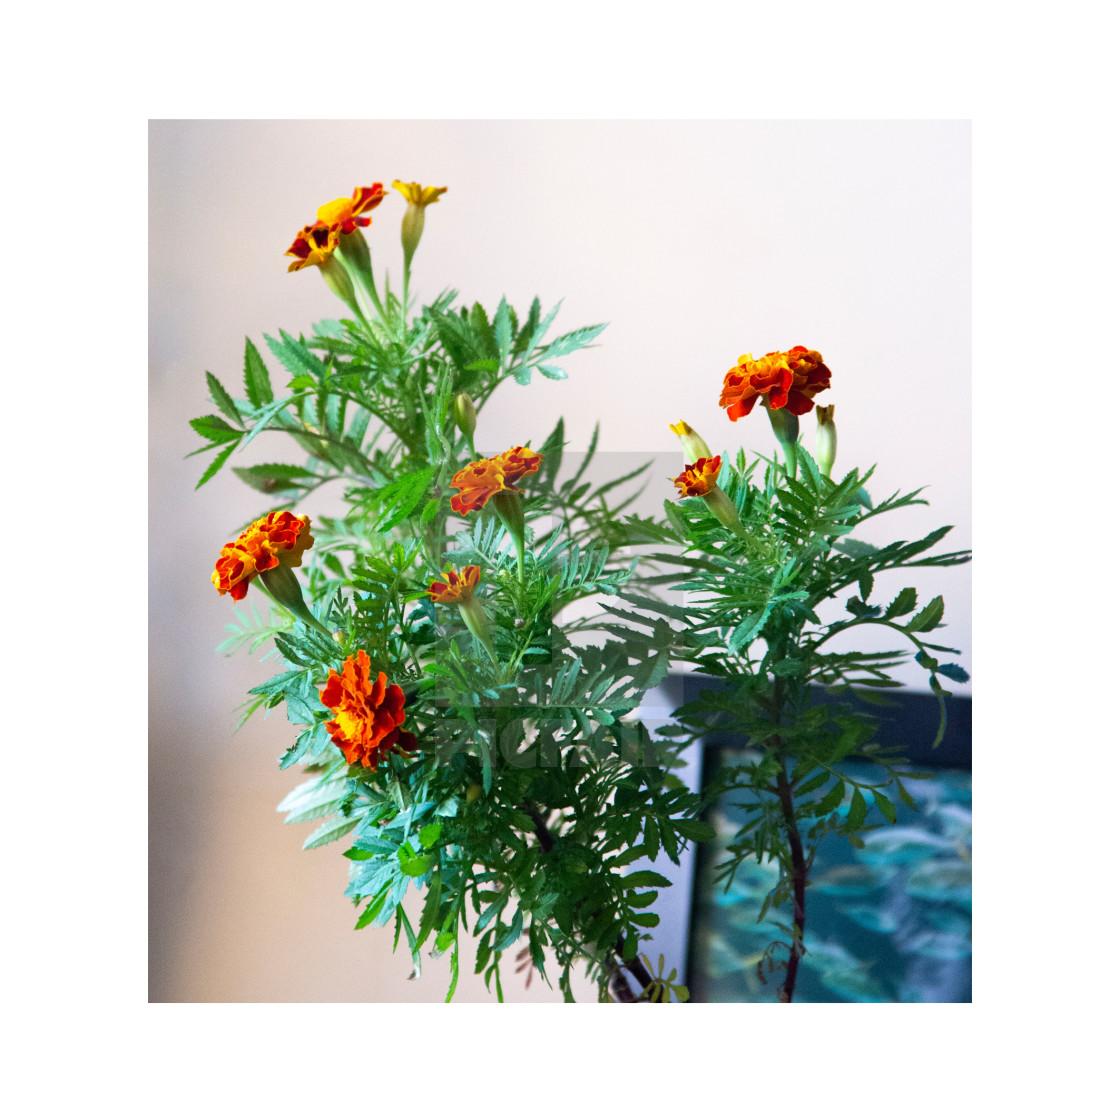 """Marigolds give me joy"" stock image"